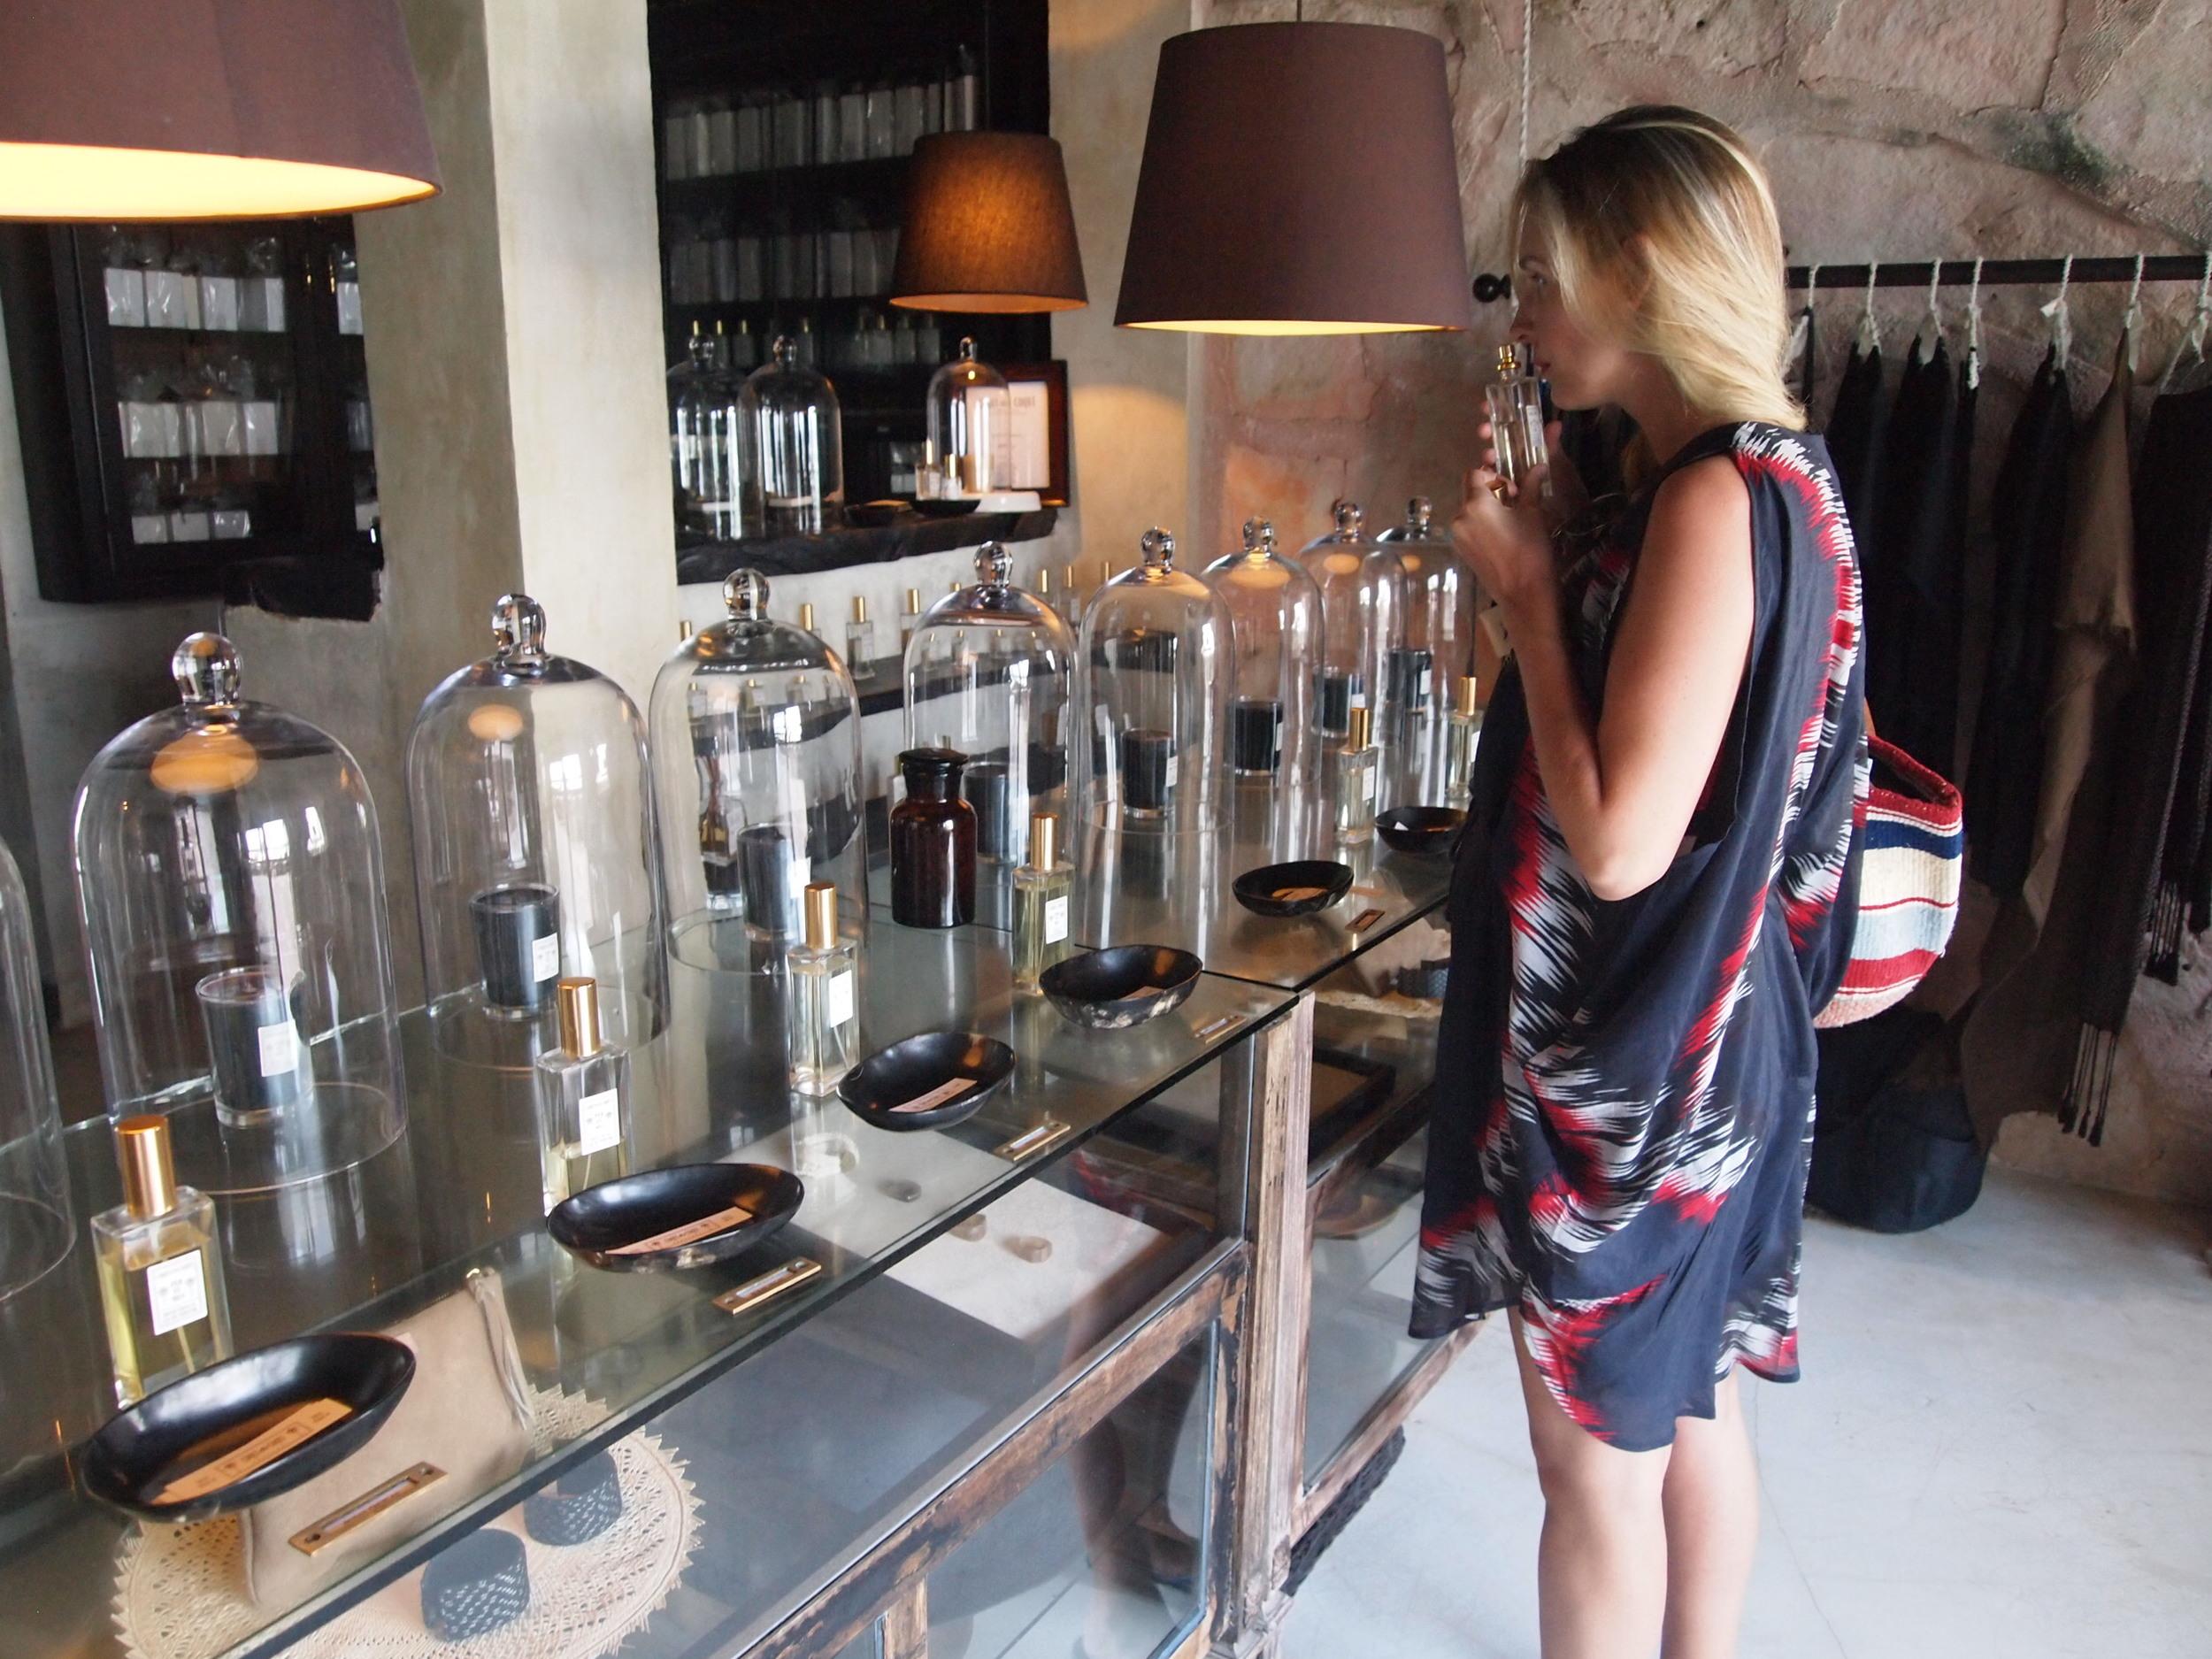 Shopping — make that buying perfume — at Coqui Coqui